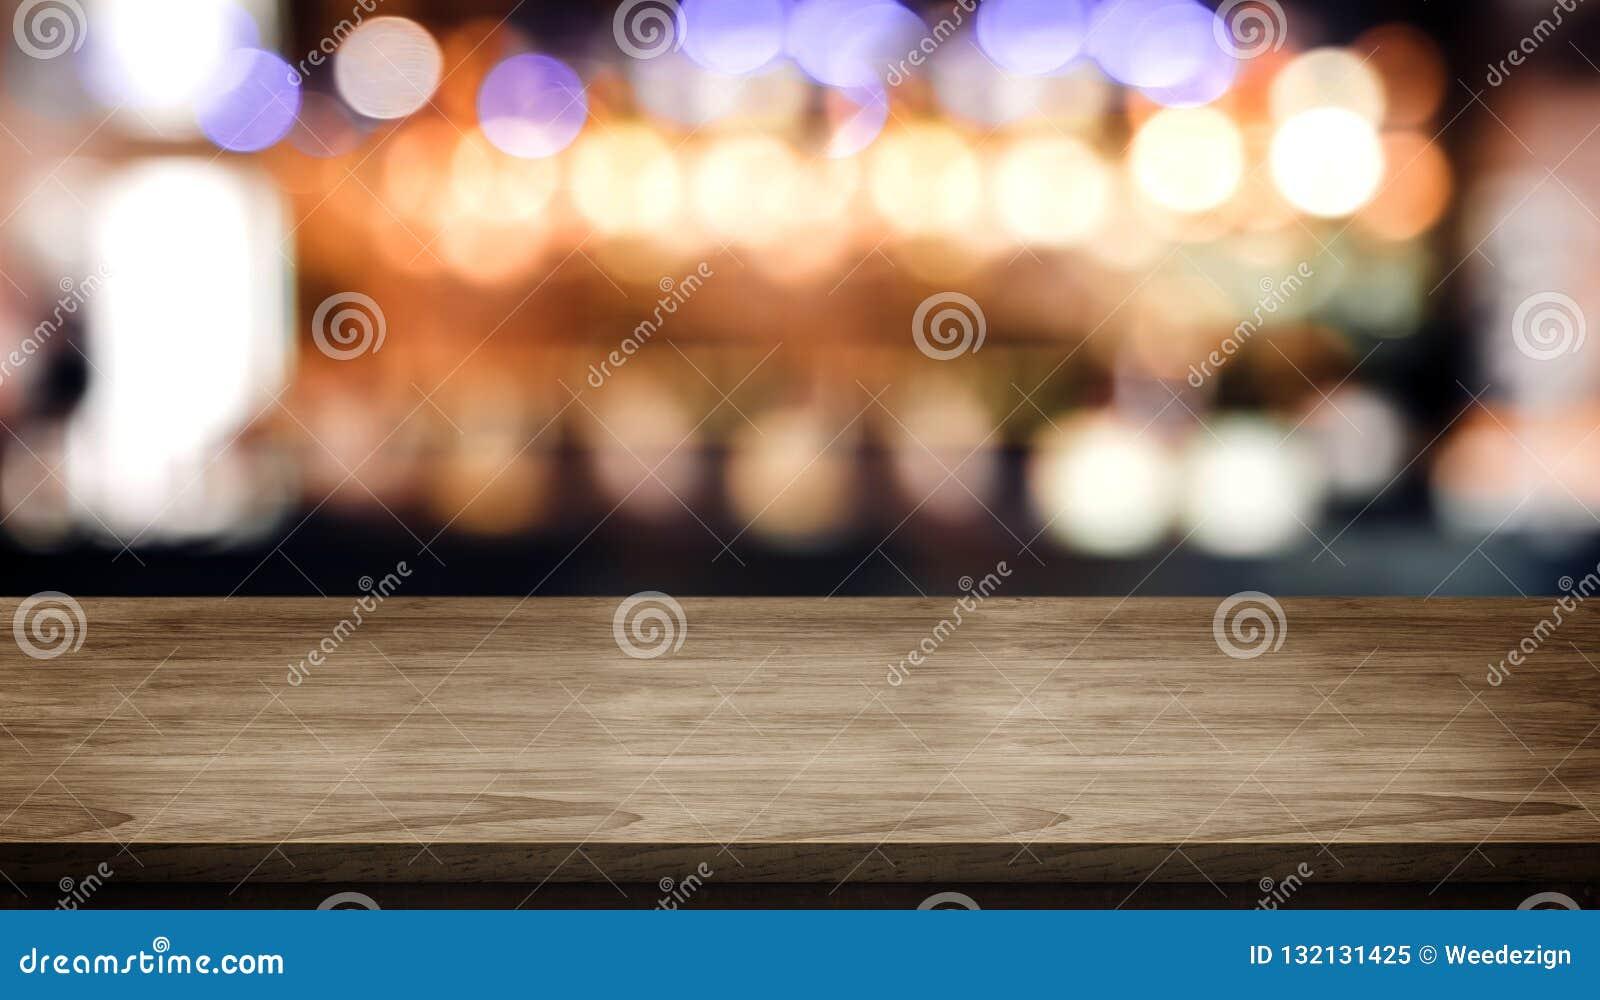 Деревянная столешница со счетчиком бара ночного клуба нерезкости со светом bokeh